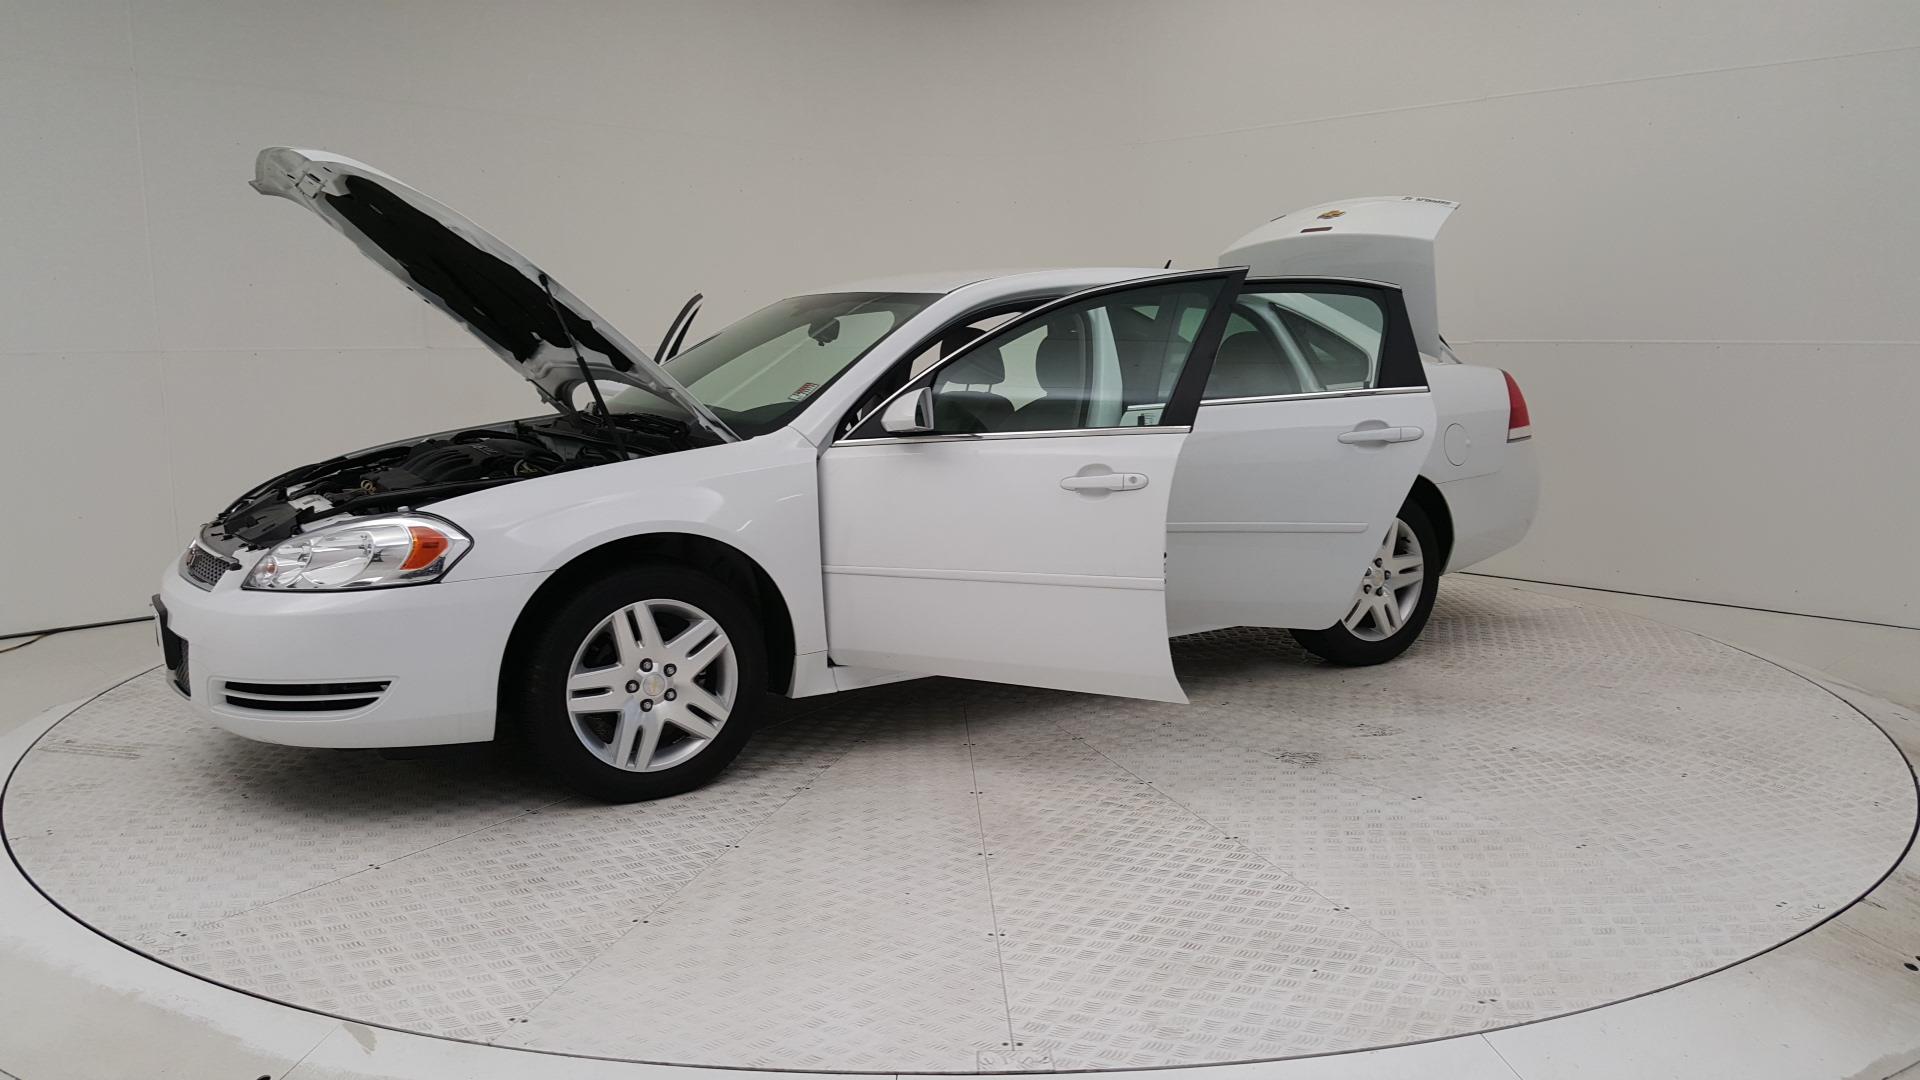 Image result for Chevrolet Impala Baltimore